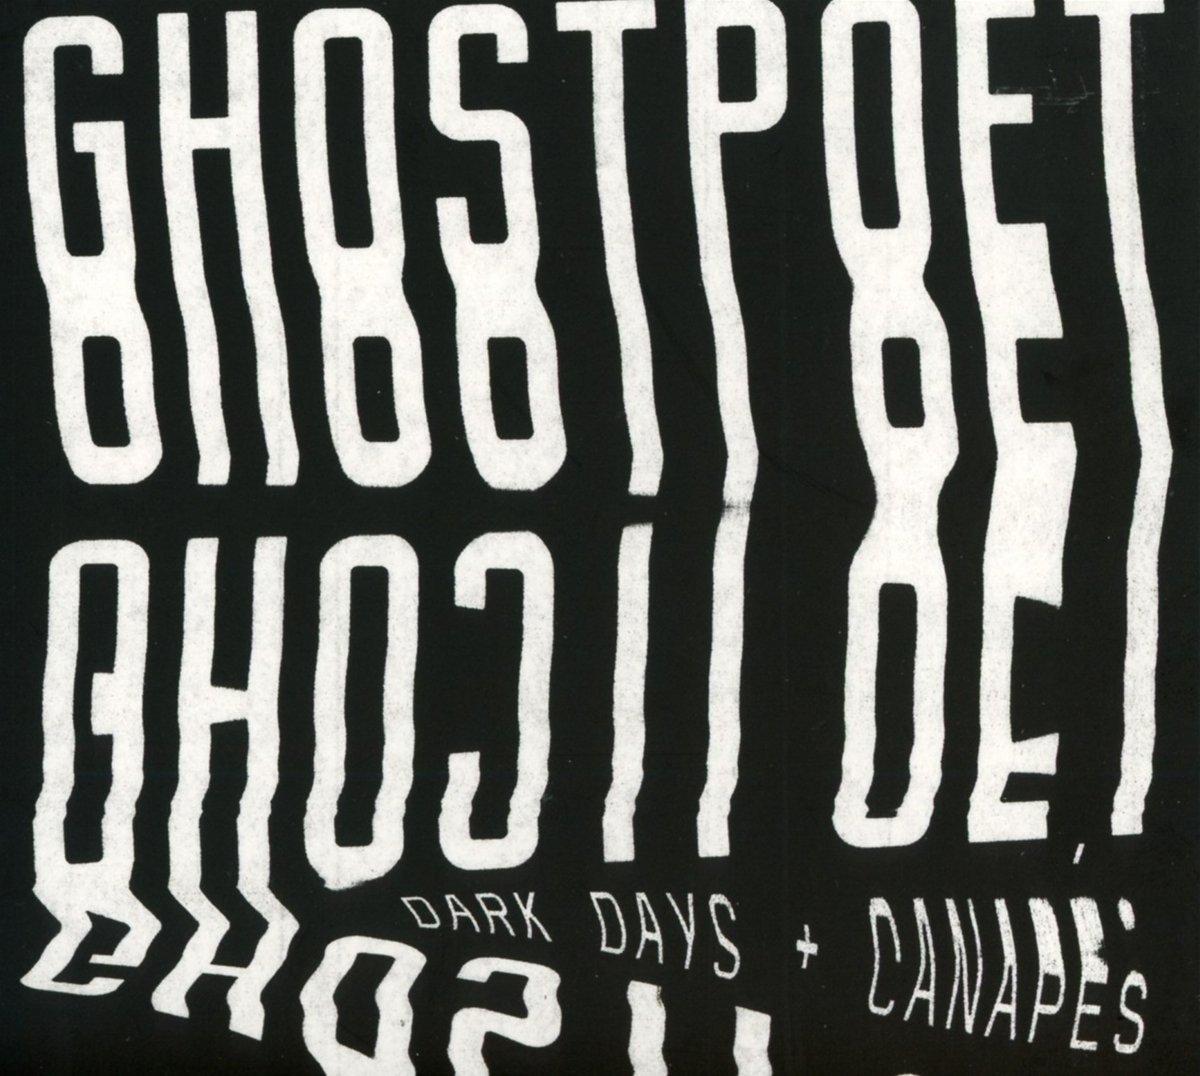 Dark Days + Canapés [Limited White Vinyl] (LP) by Ghostpoet image